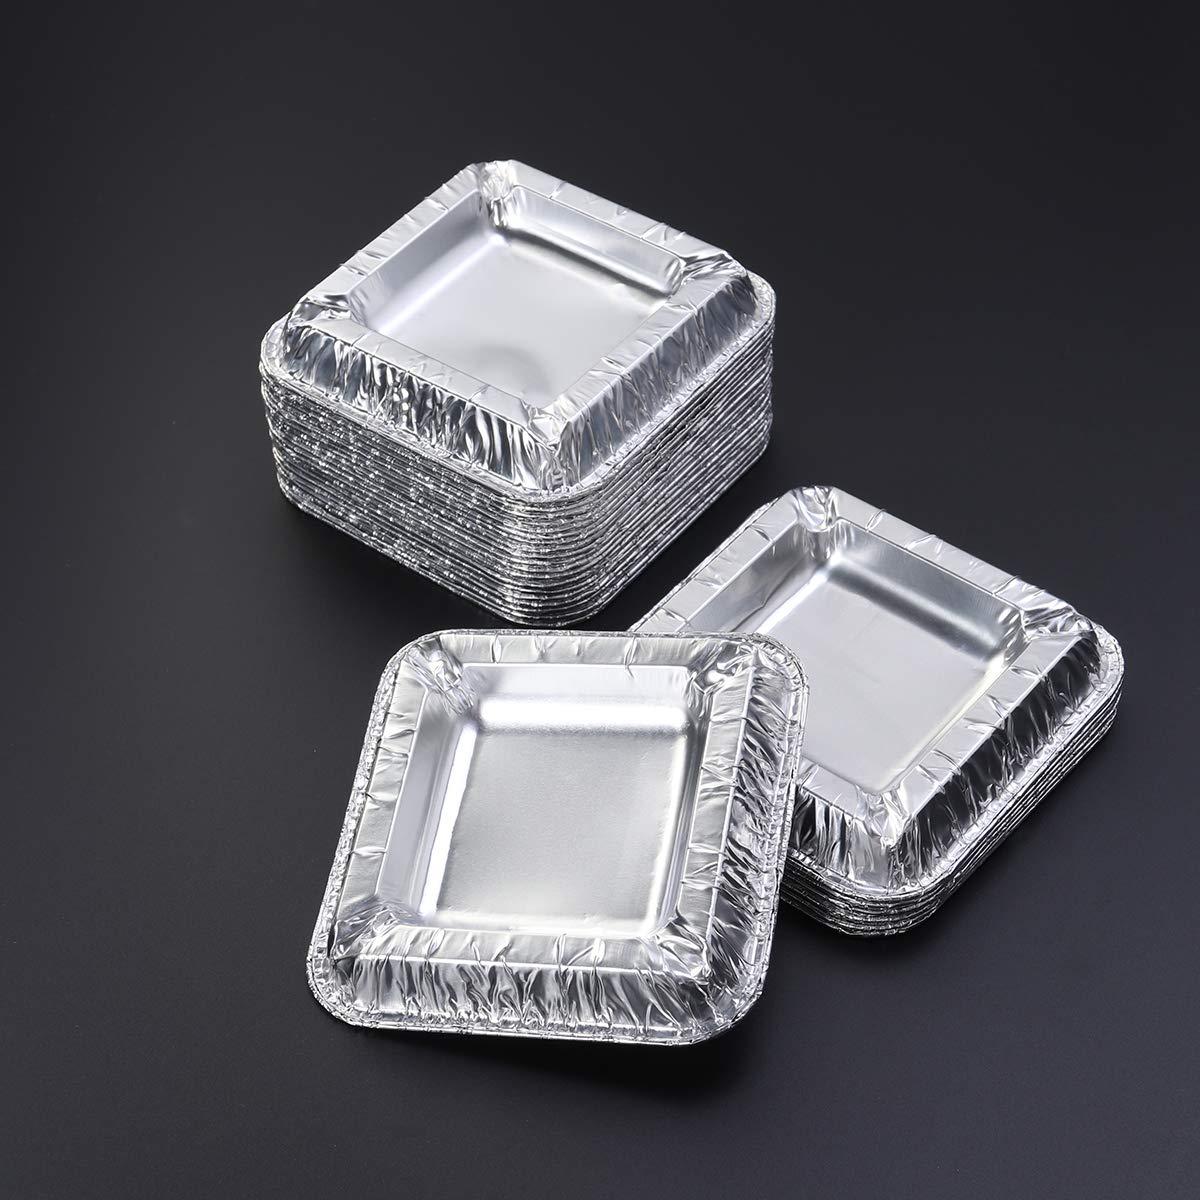 LIOOBO 25PCS Square Aluminiumfolie Aschenbecher Einweg unzerbrechlichen Aschenbecher